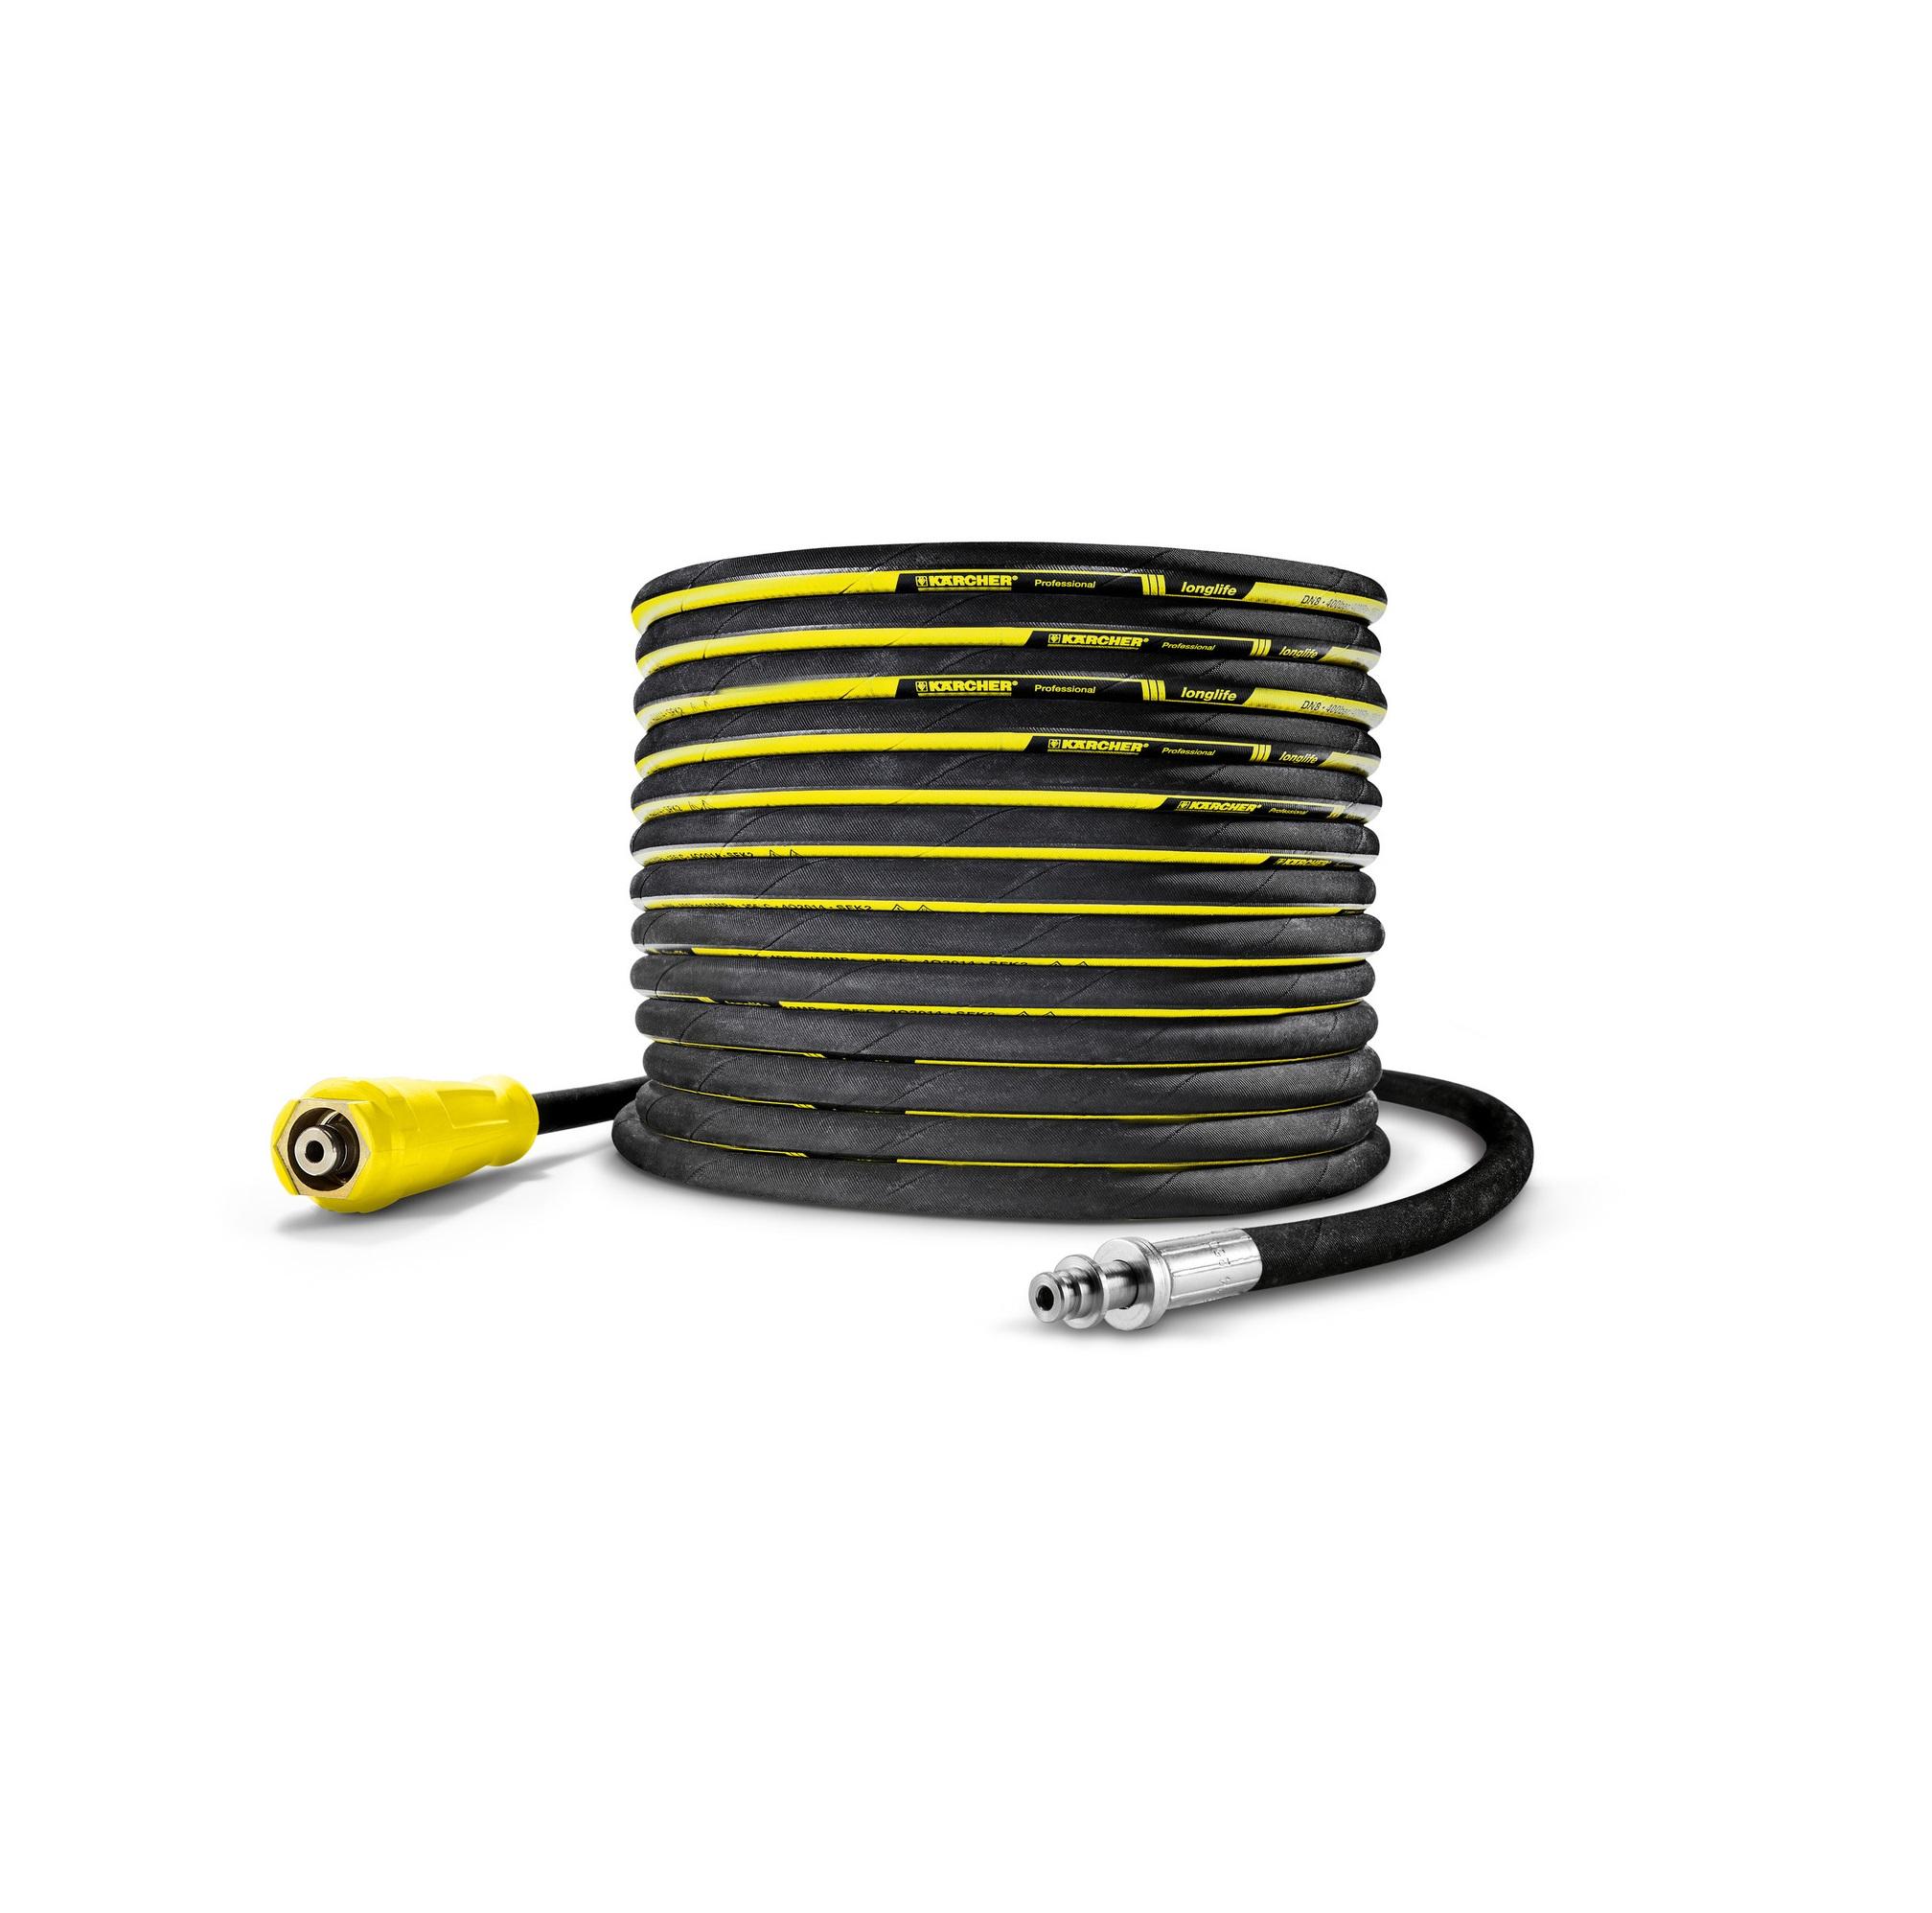 Маркуч високо налягане Karcher HD-маркуч DN 8, 20 m, 400 bar